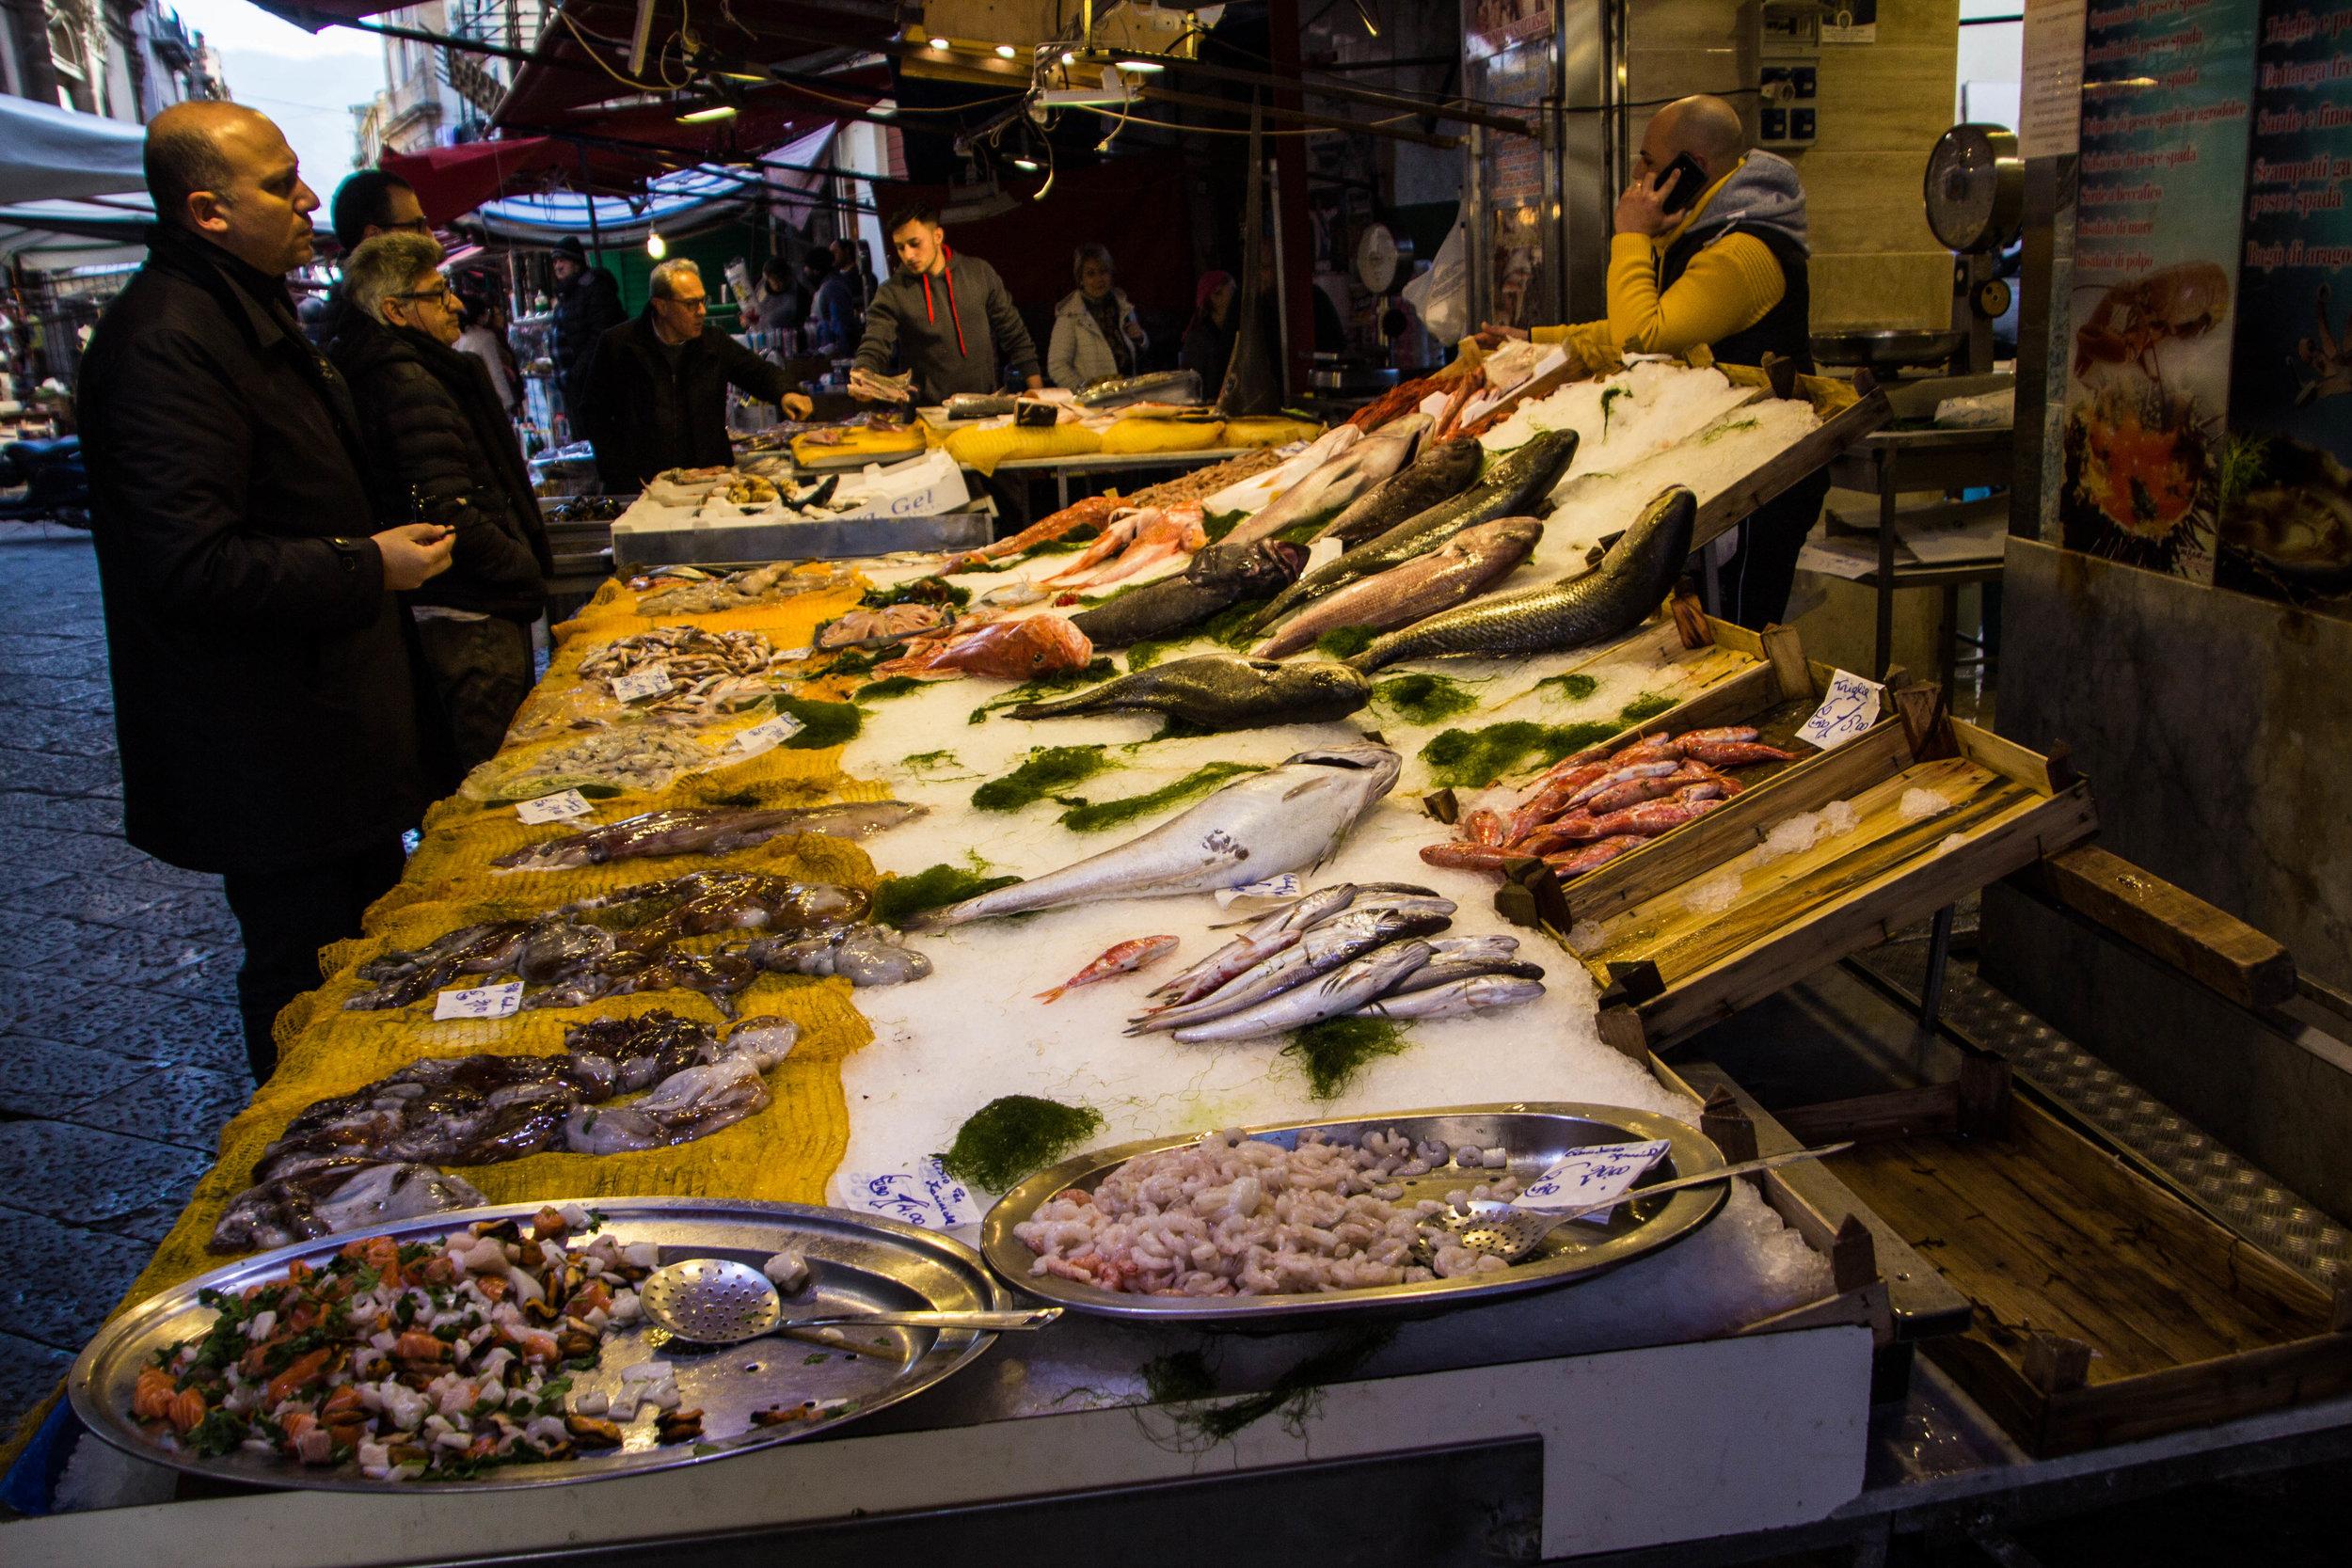 street-markets-palermo-sicily-3.jpg